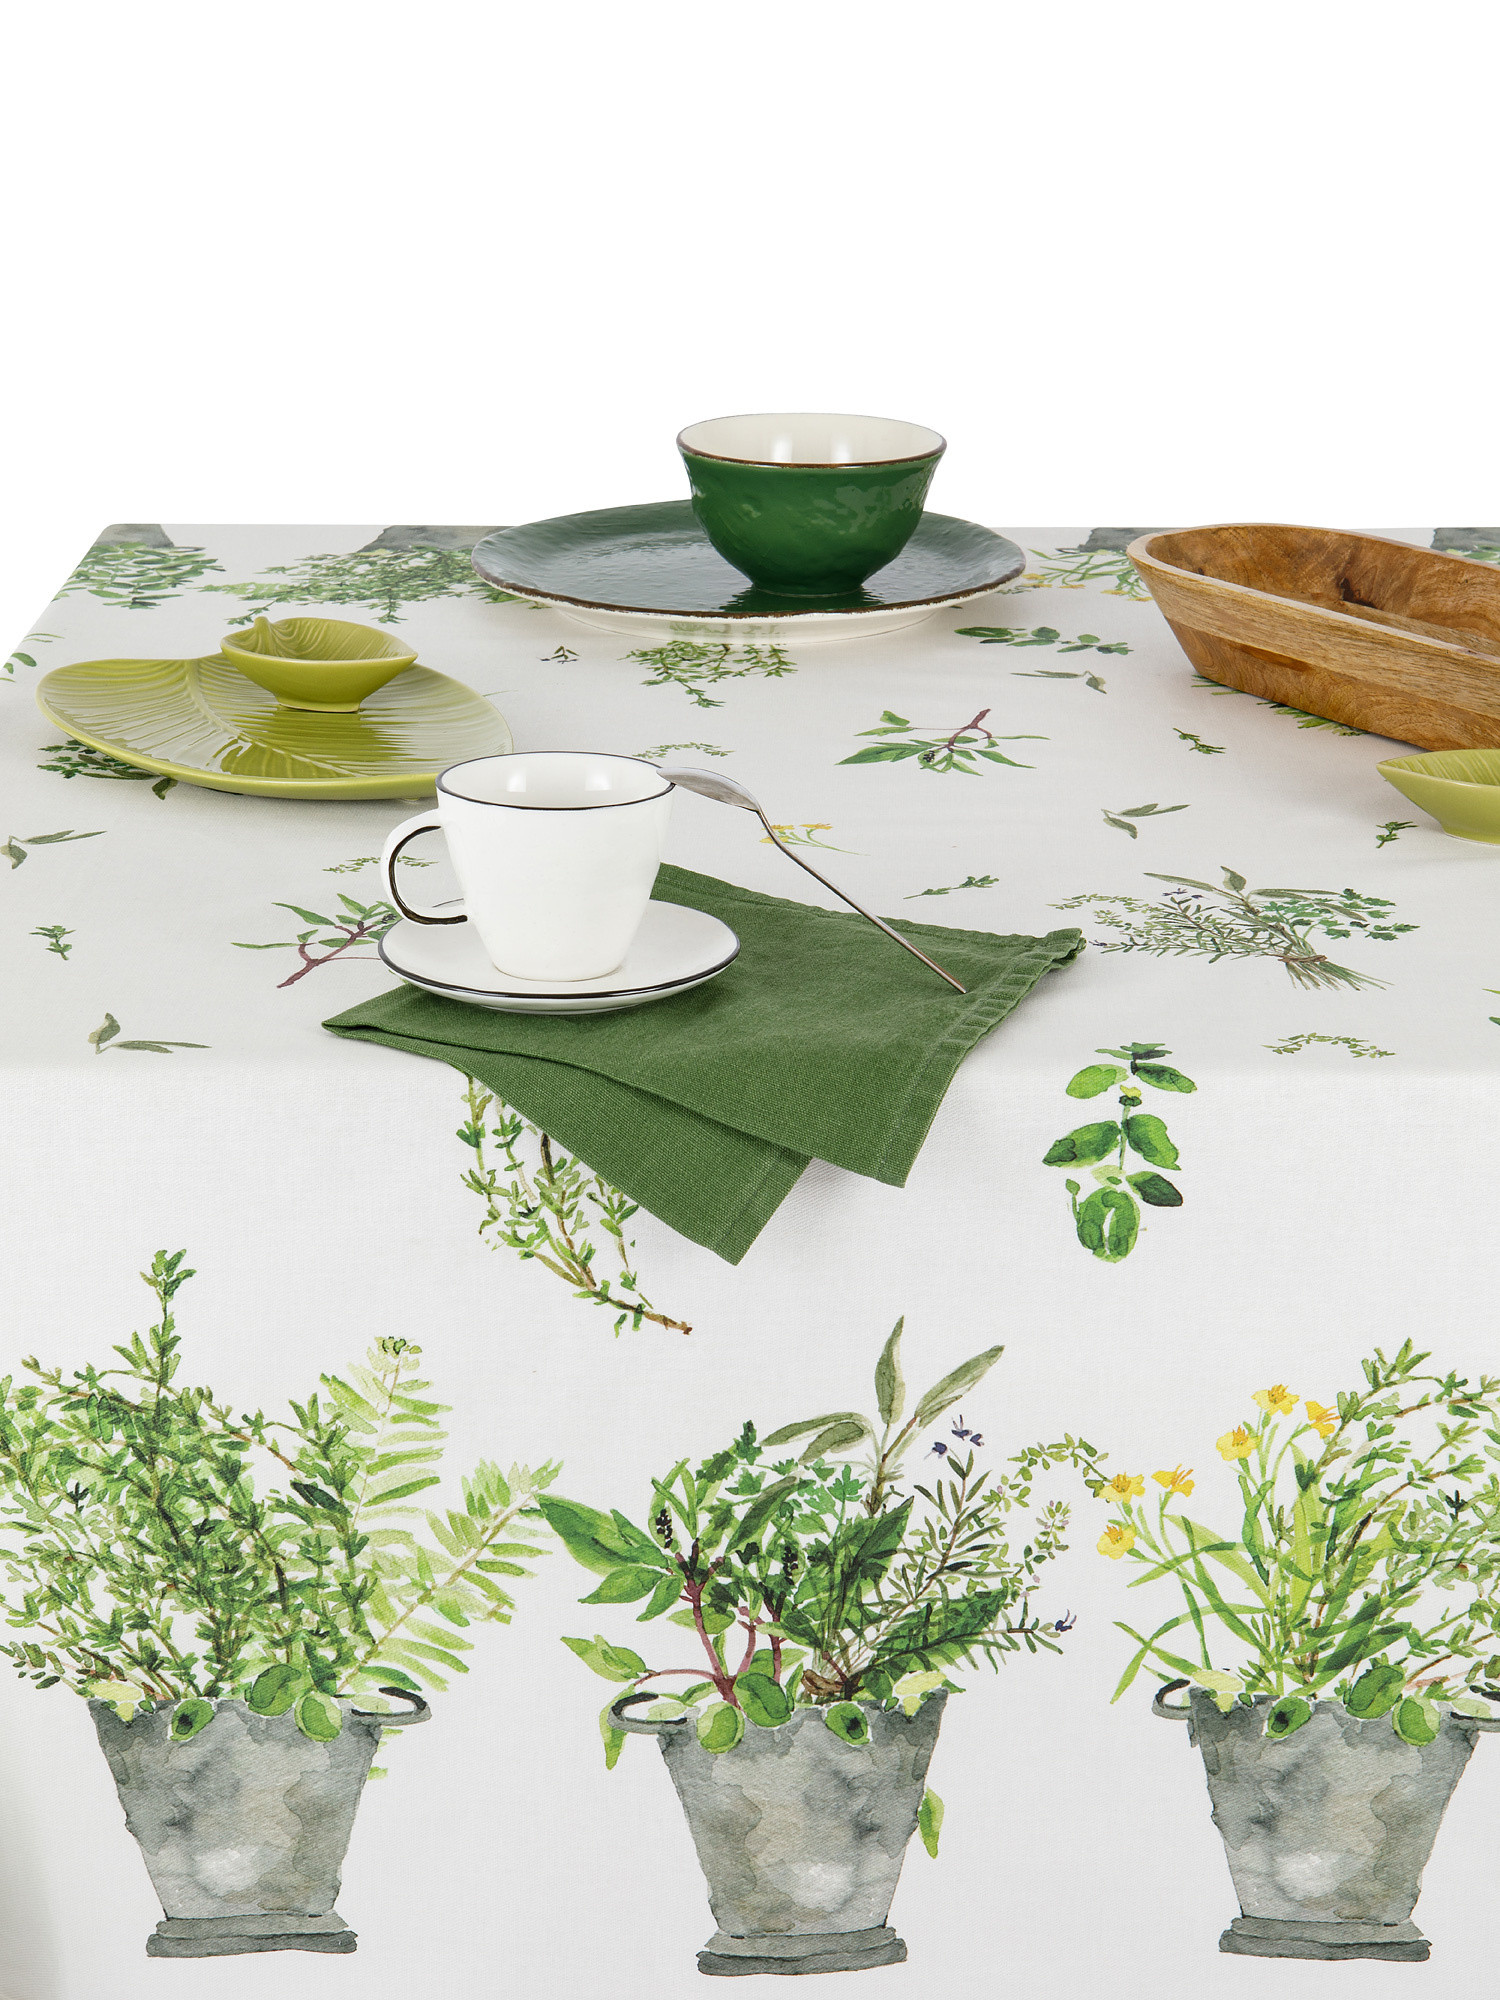 Tovaglia cotone idrorepellente stampa garden, Verde, large image number 1